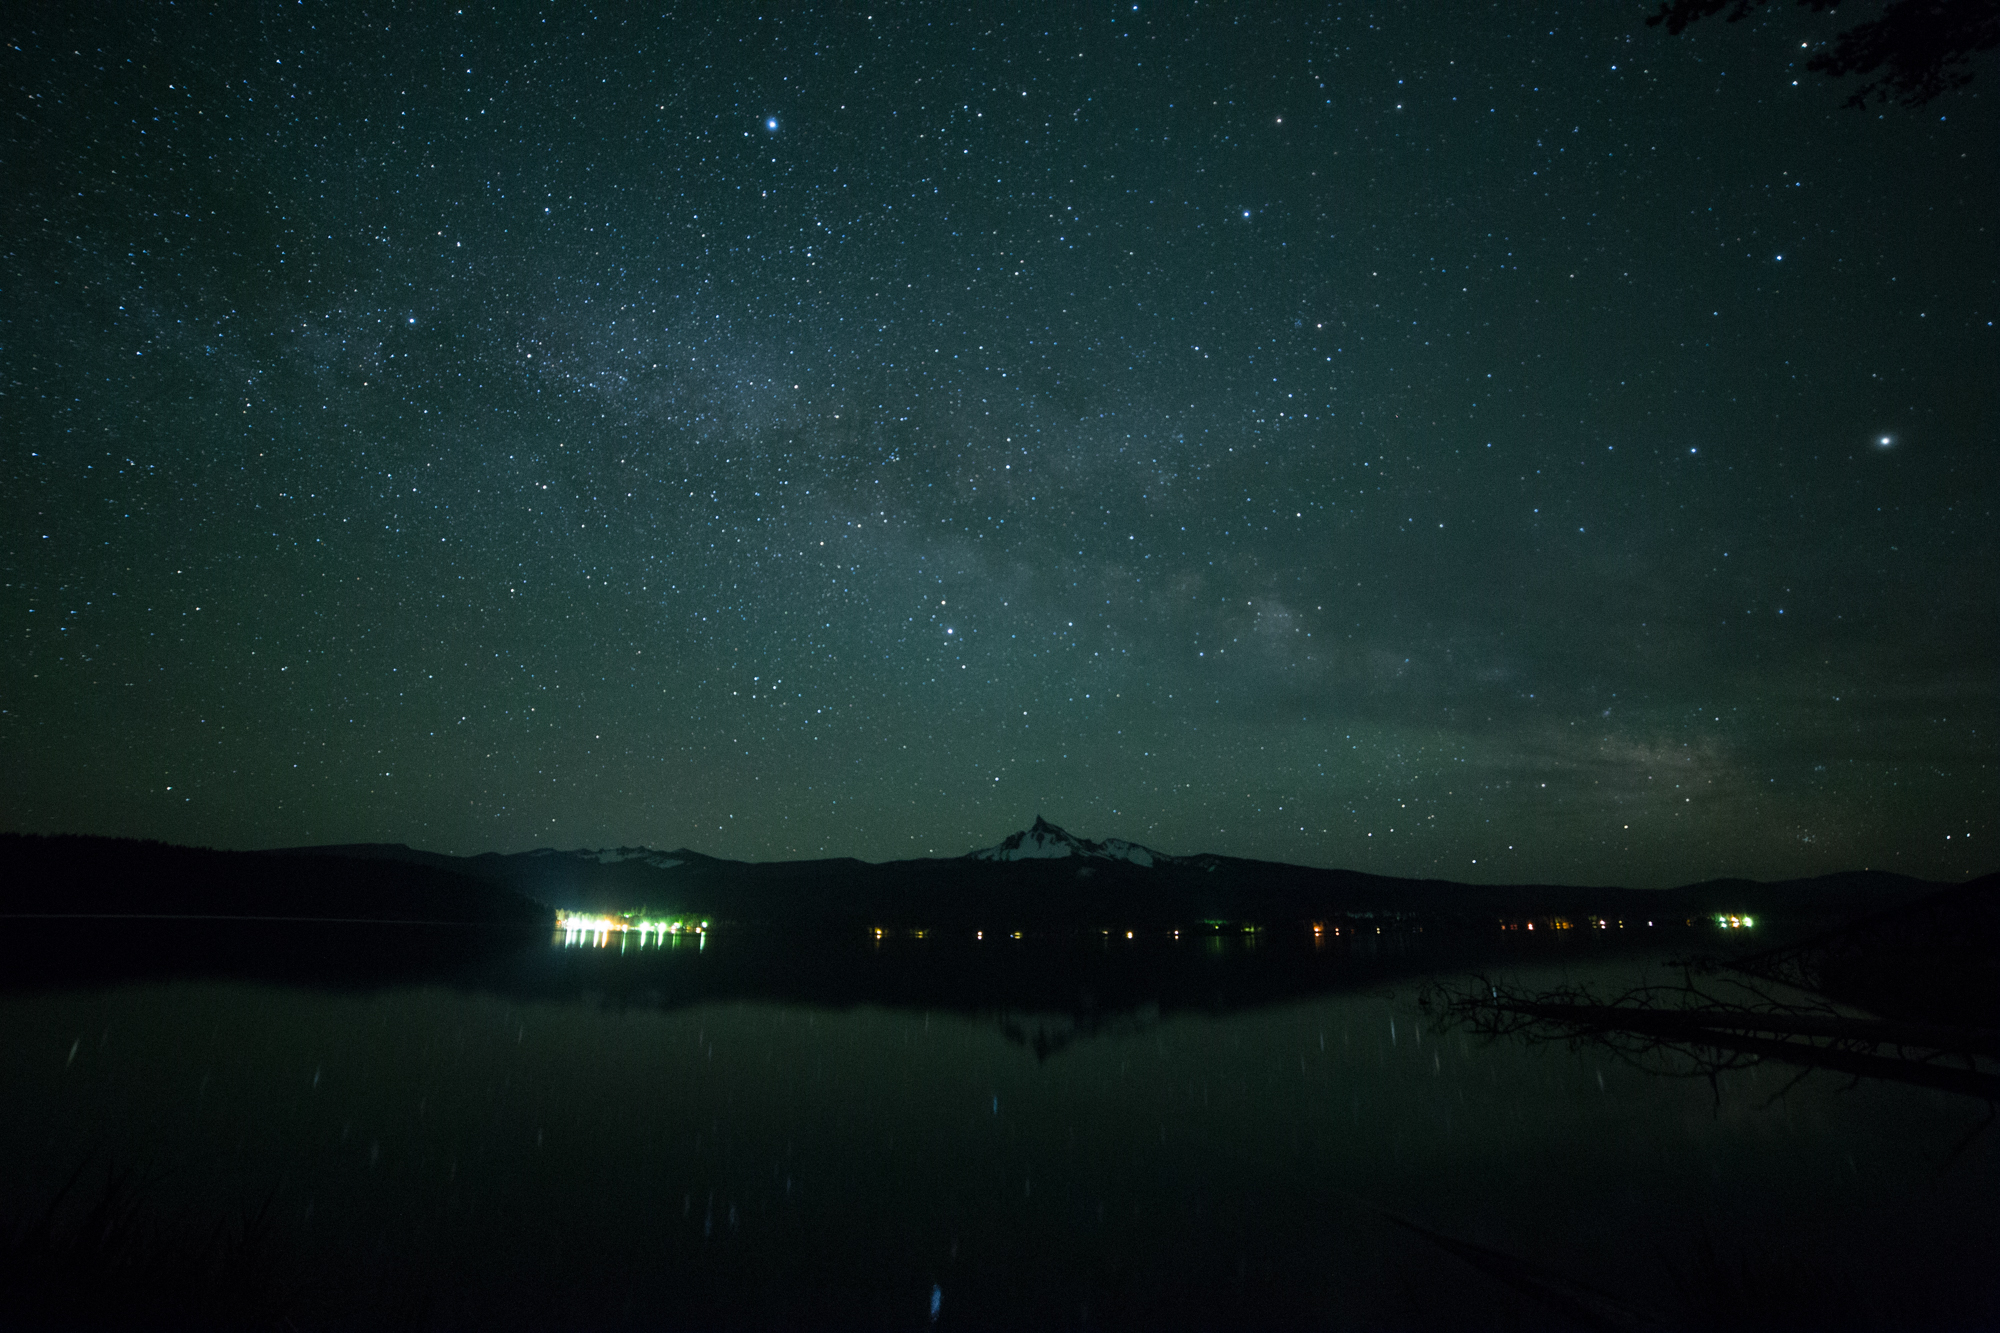 "f/2.8, ISO 6400, 20"", Diamond Lake, Oregon, 5/29/16, 12:00am. Unedited."